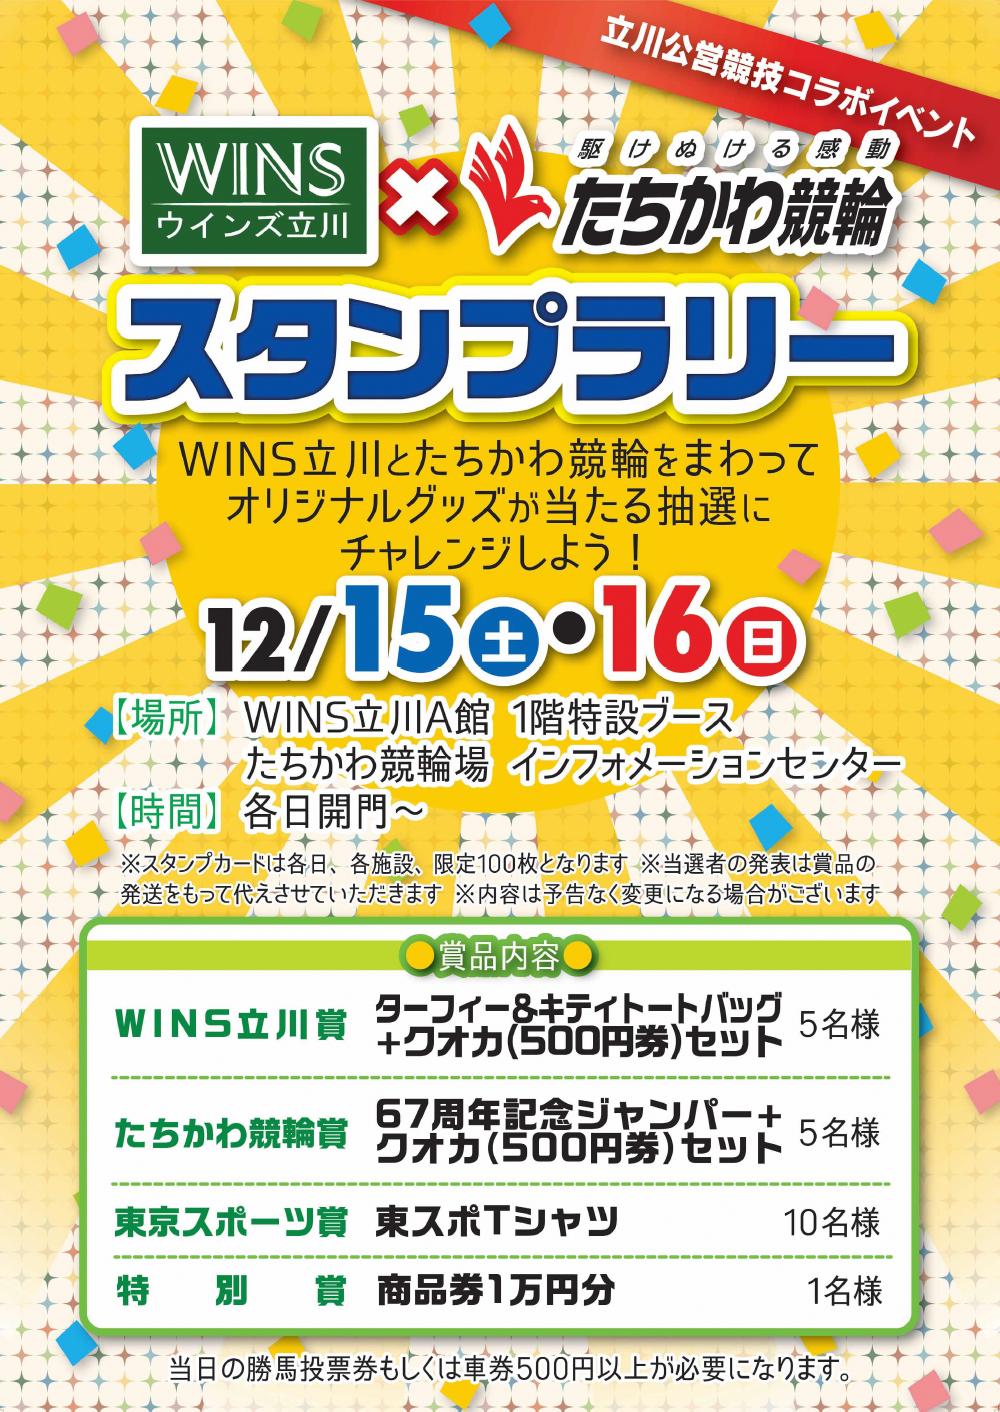 WINS立川コラボスタンプラリーポスター